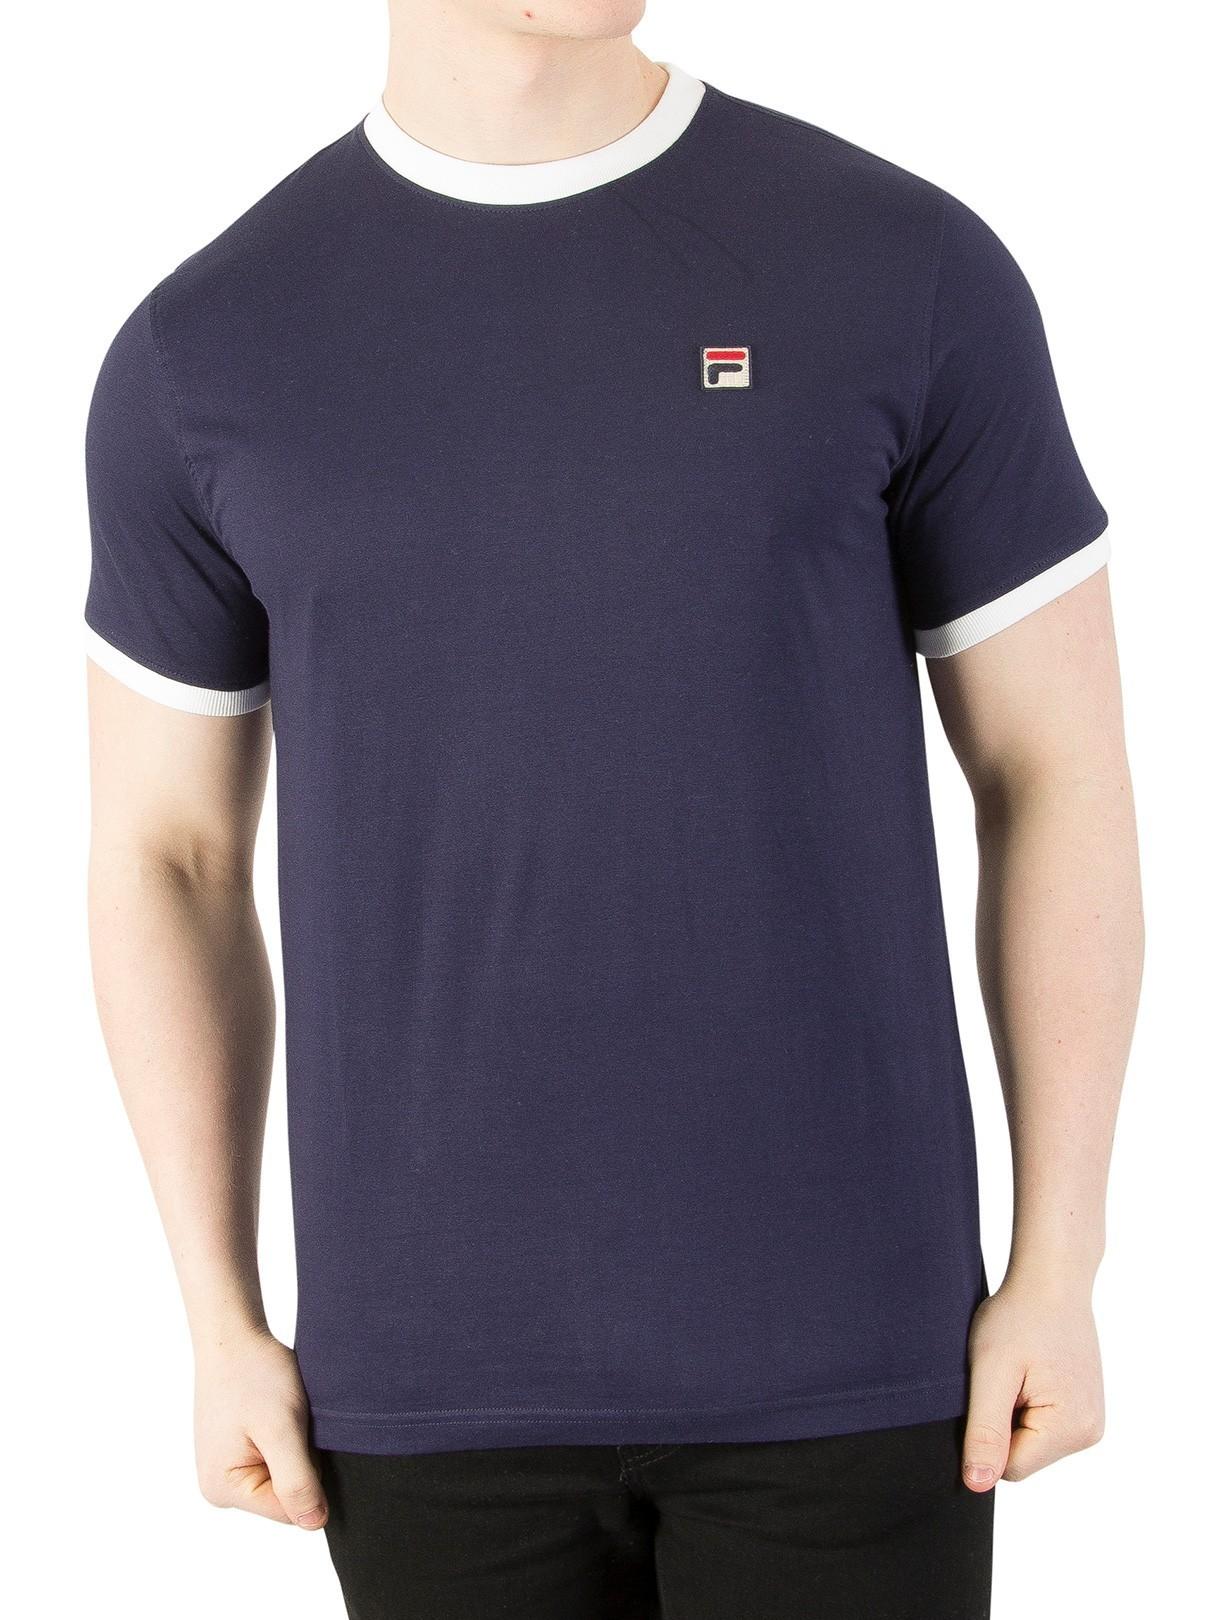 83ea446b88ae Fila Vintage Peacoat Marconi T-Shirt